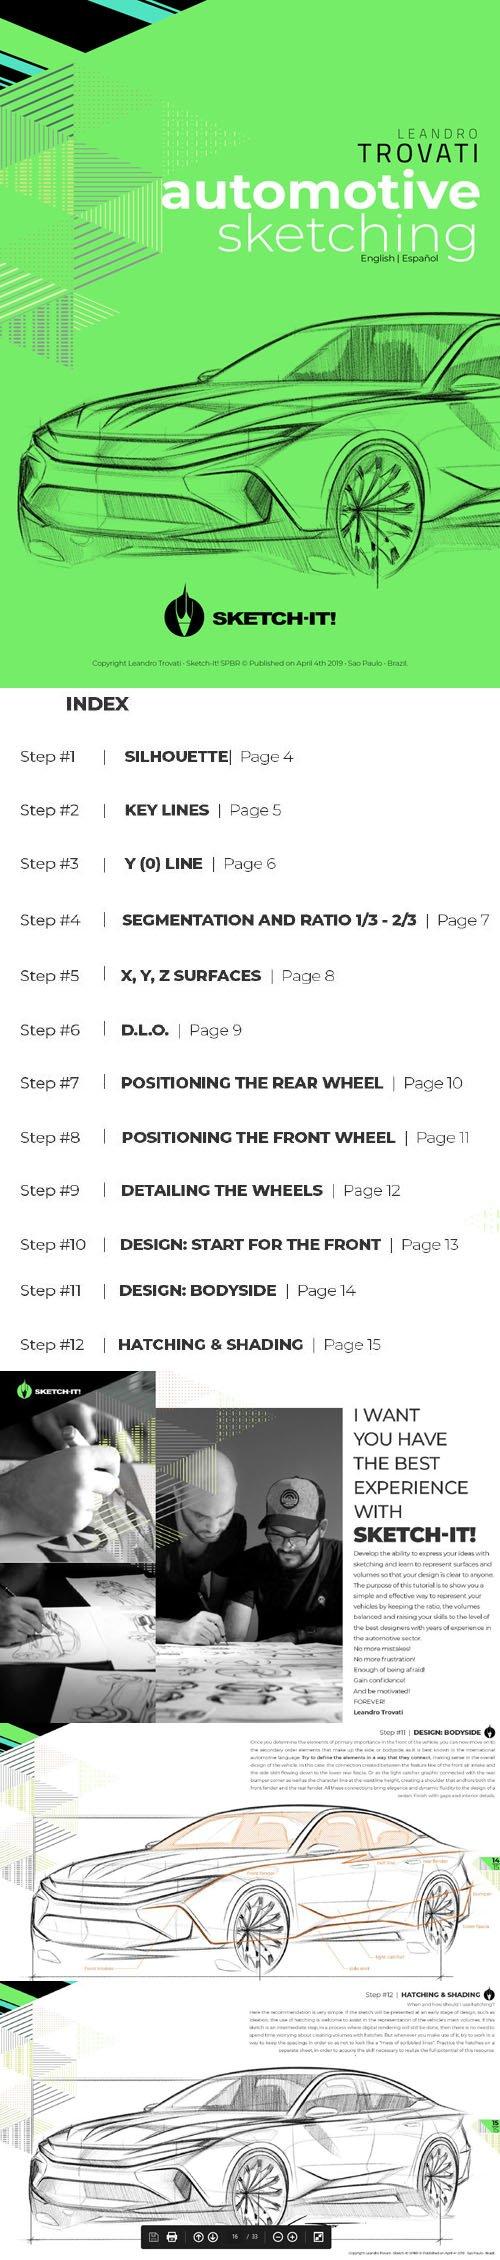 Sketch-It! Automotive Sketching E-book (ENG|SPA|BR)